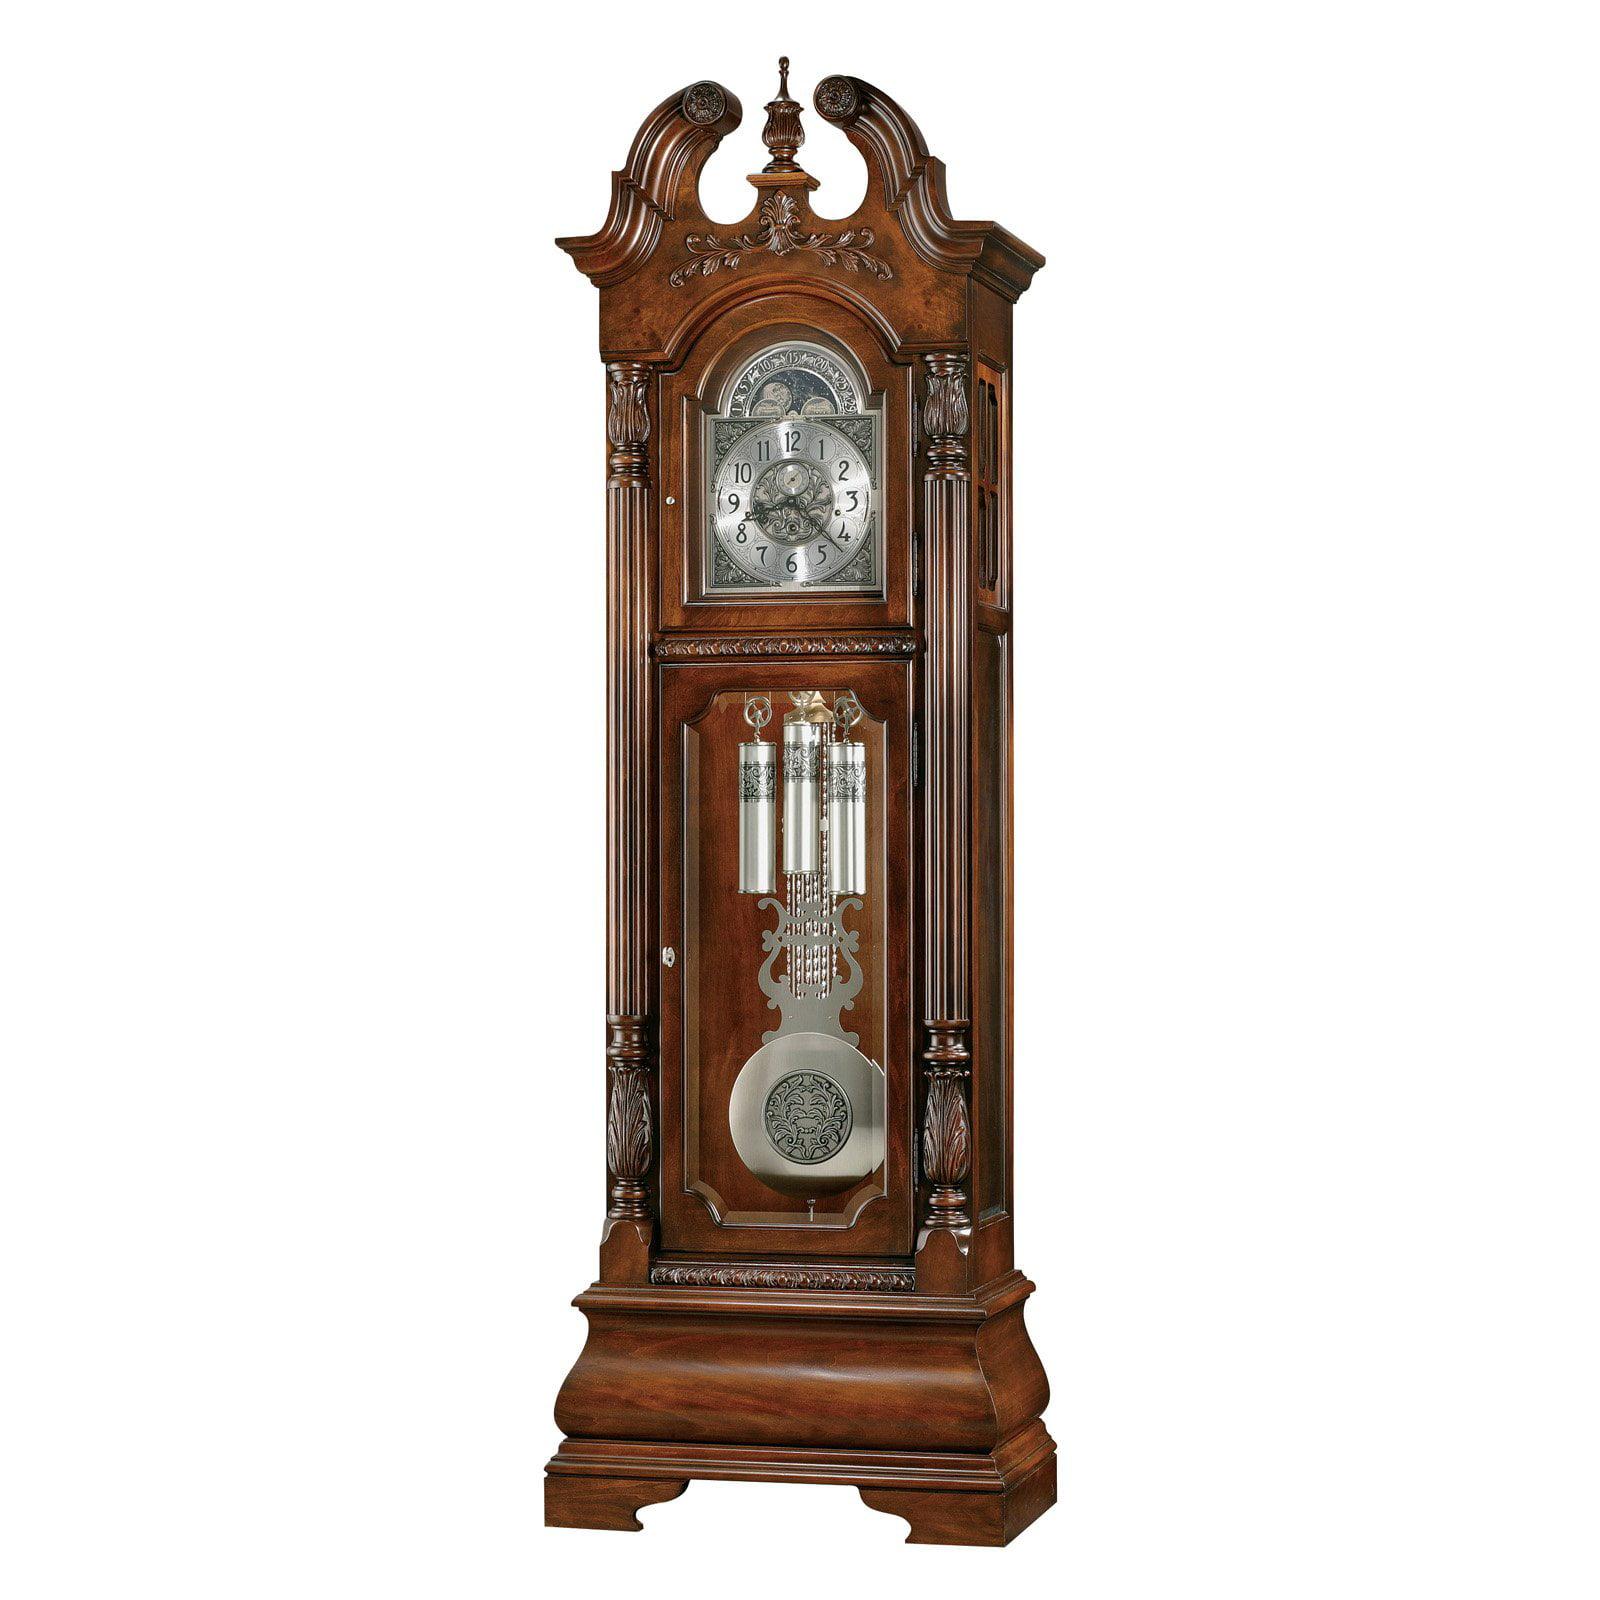 Howard Miller 611-132 Stratford Grandfather Clock by Howard Miller